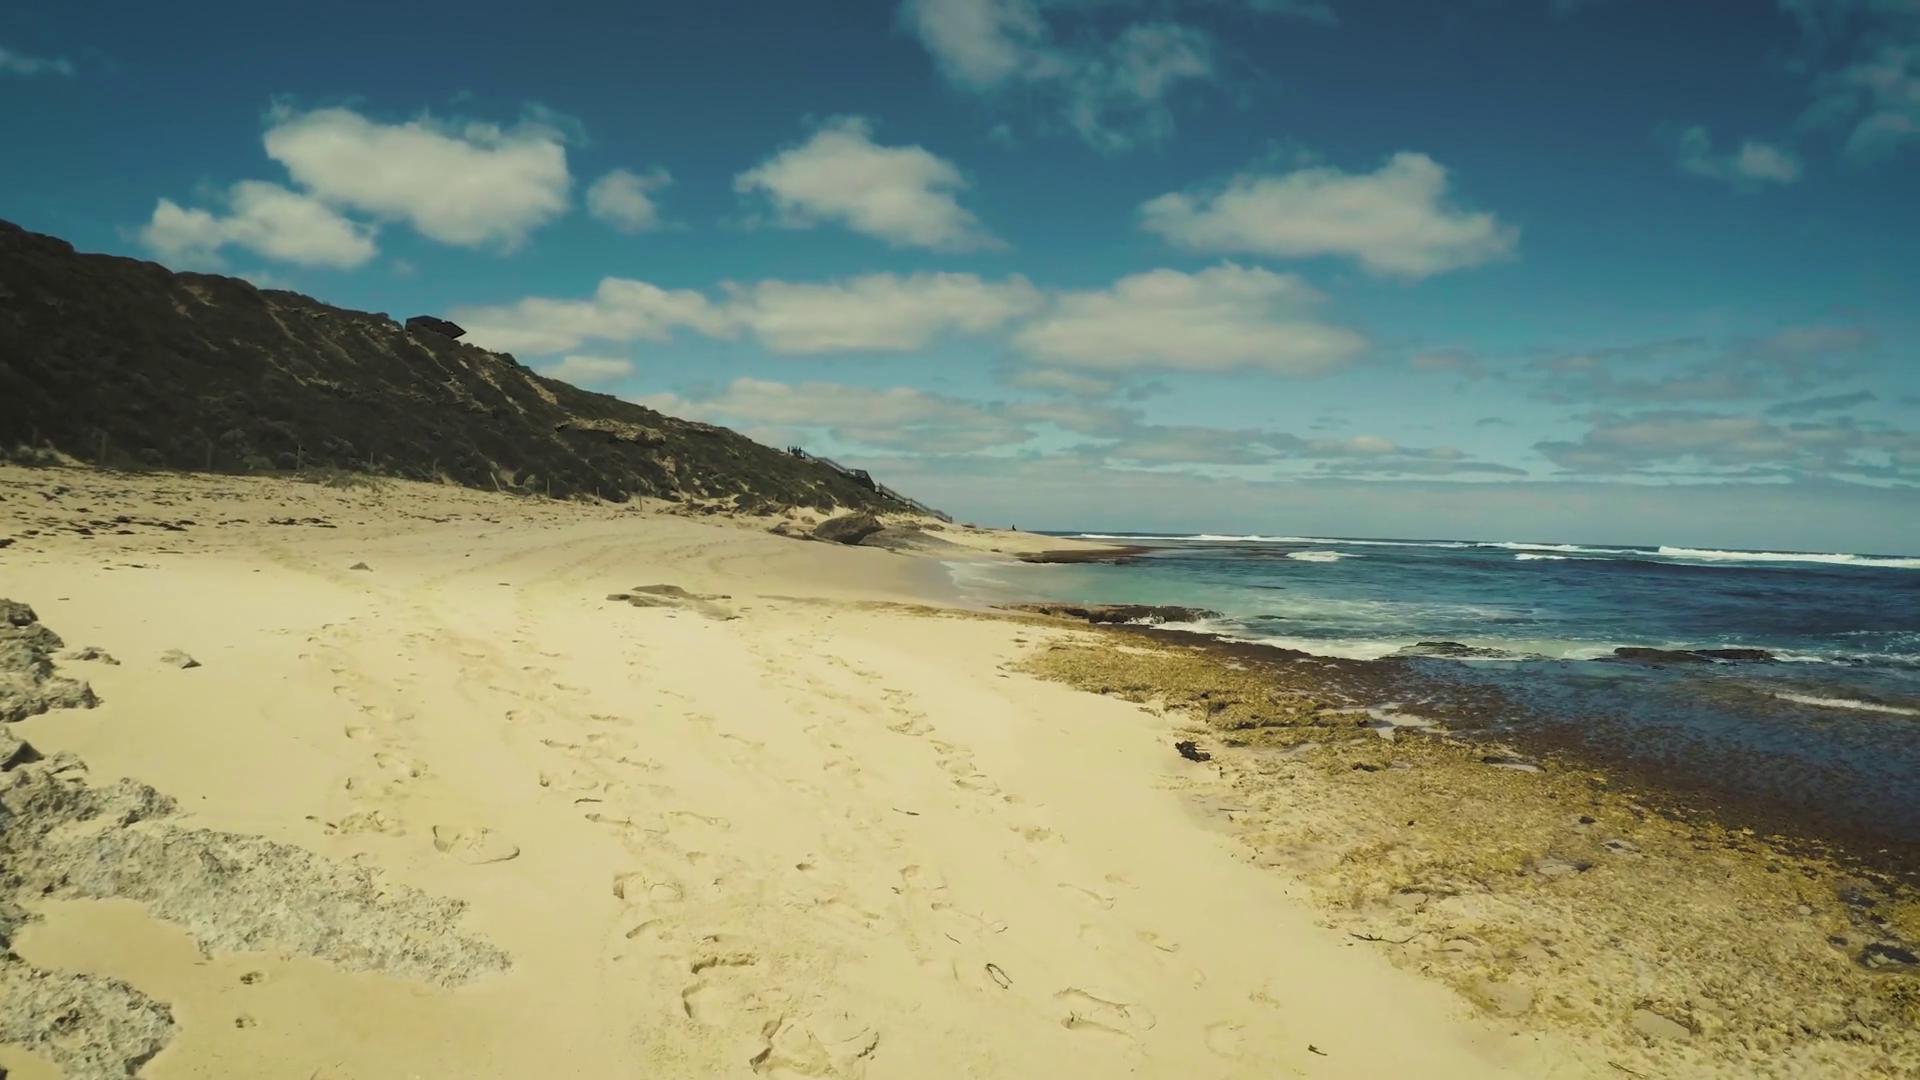 Walking on an ocean rocky sand beach, shot in 4k first person ...